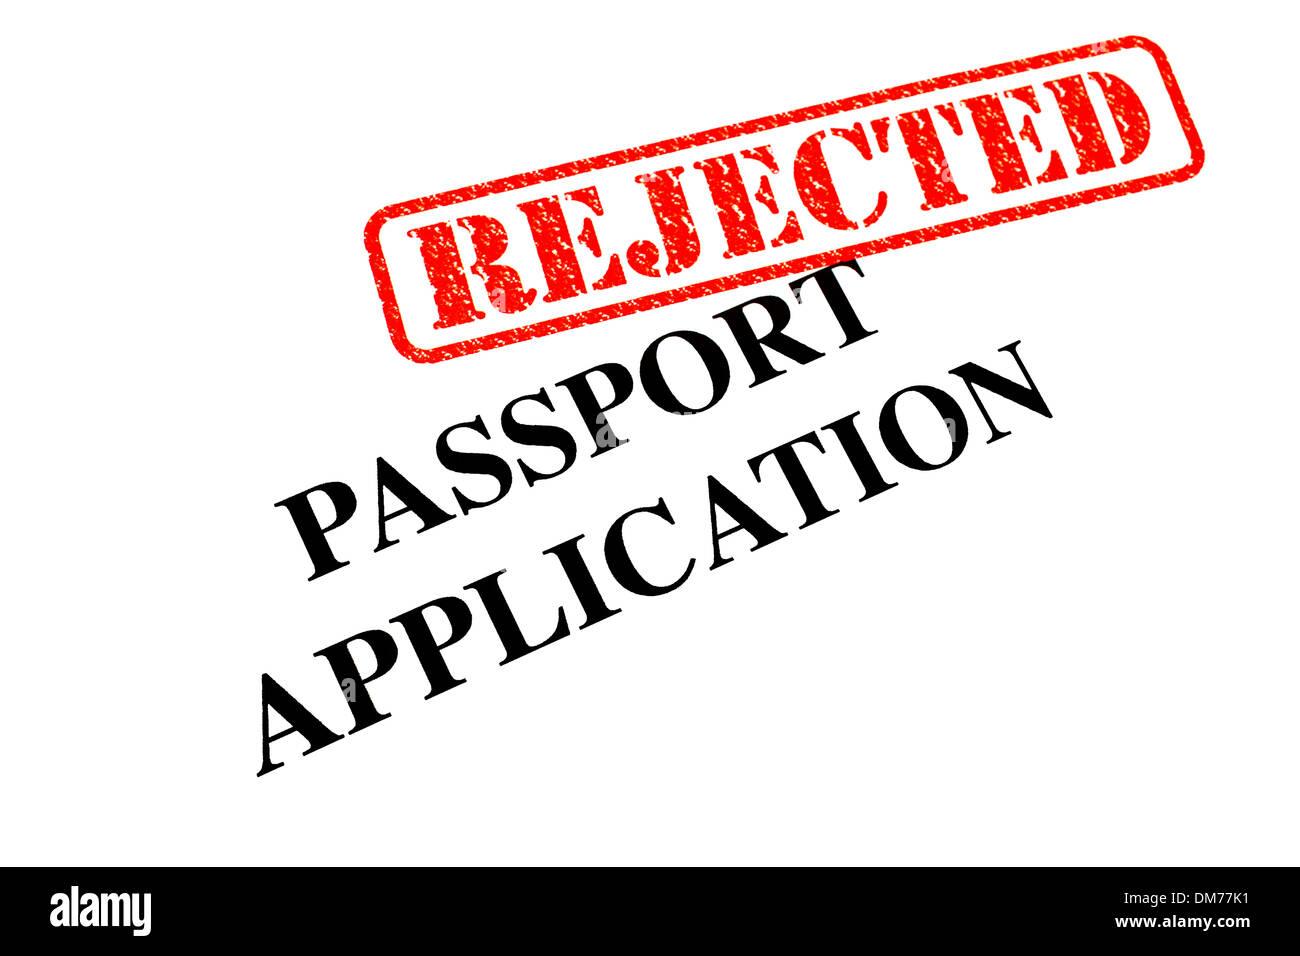 Passport Application has been REJECTED. Stock Photo